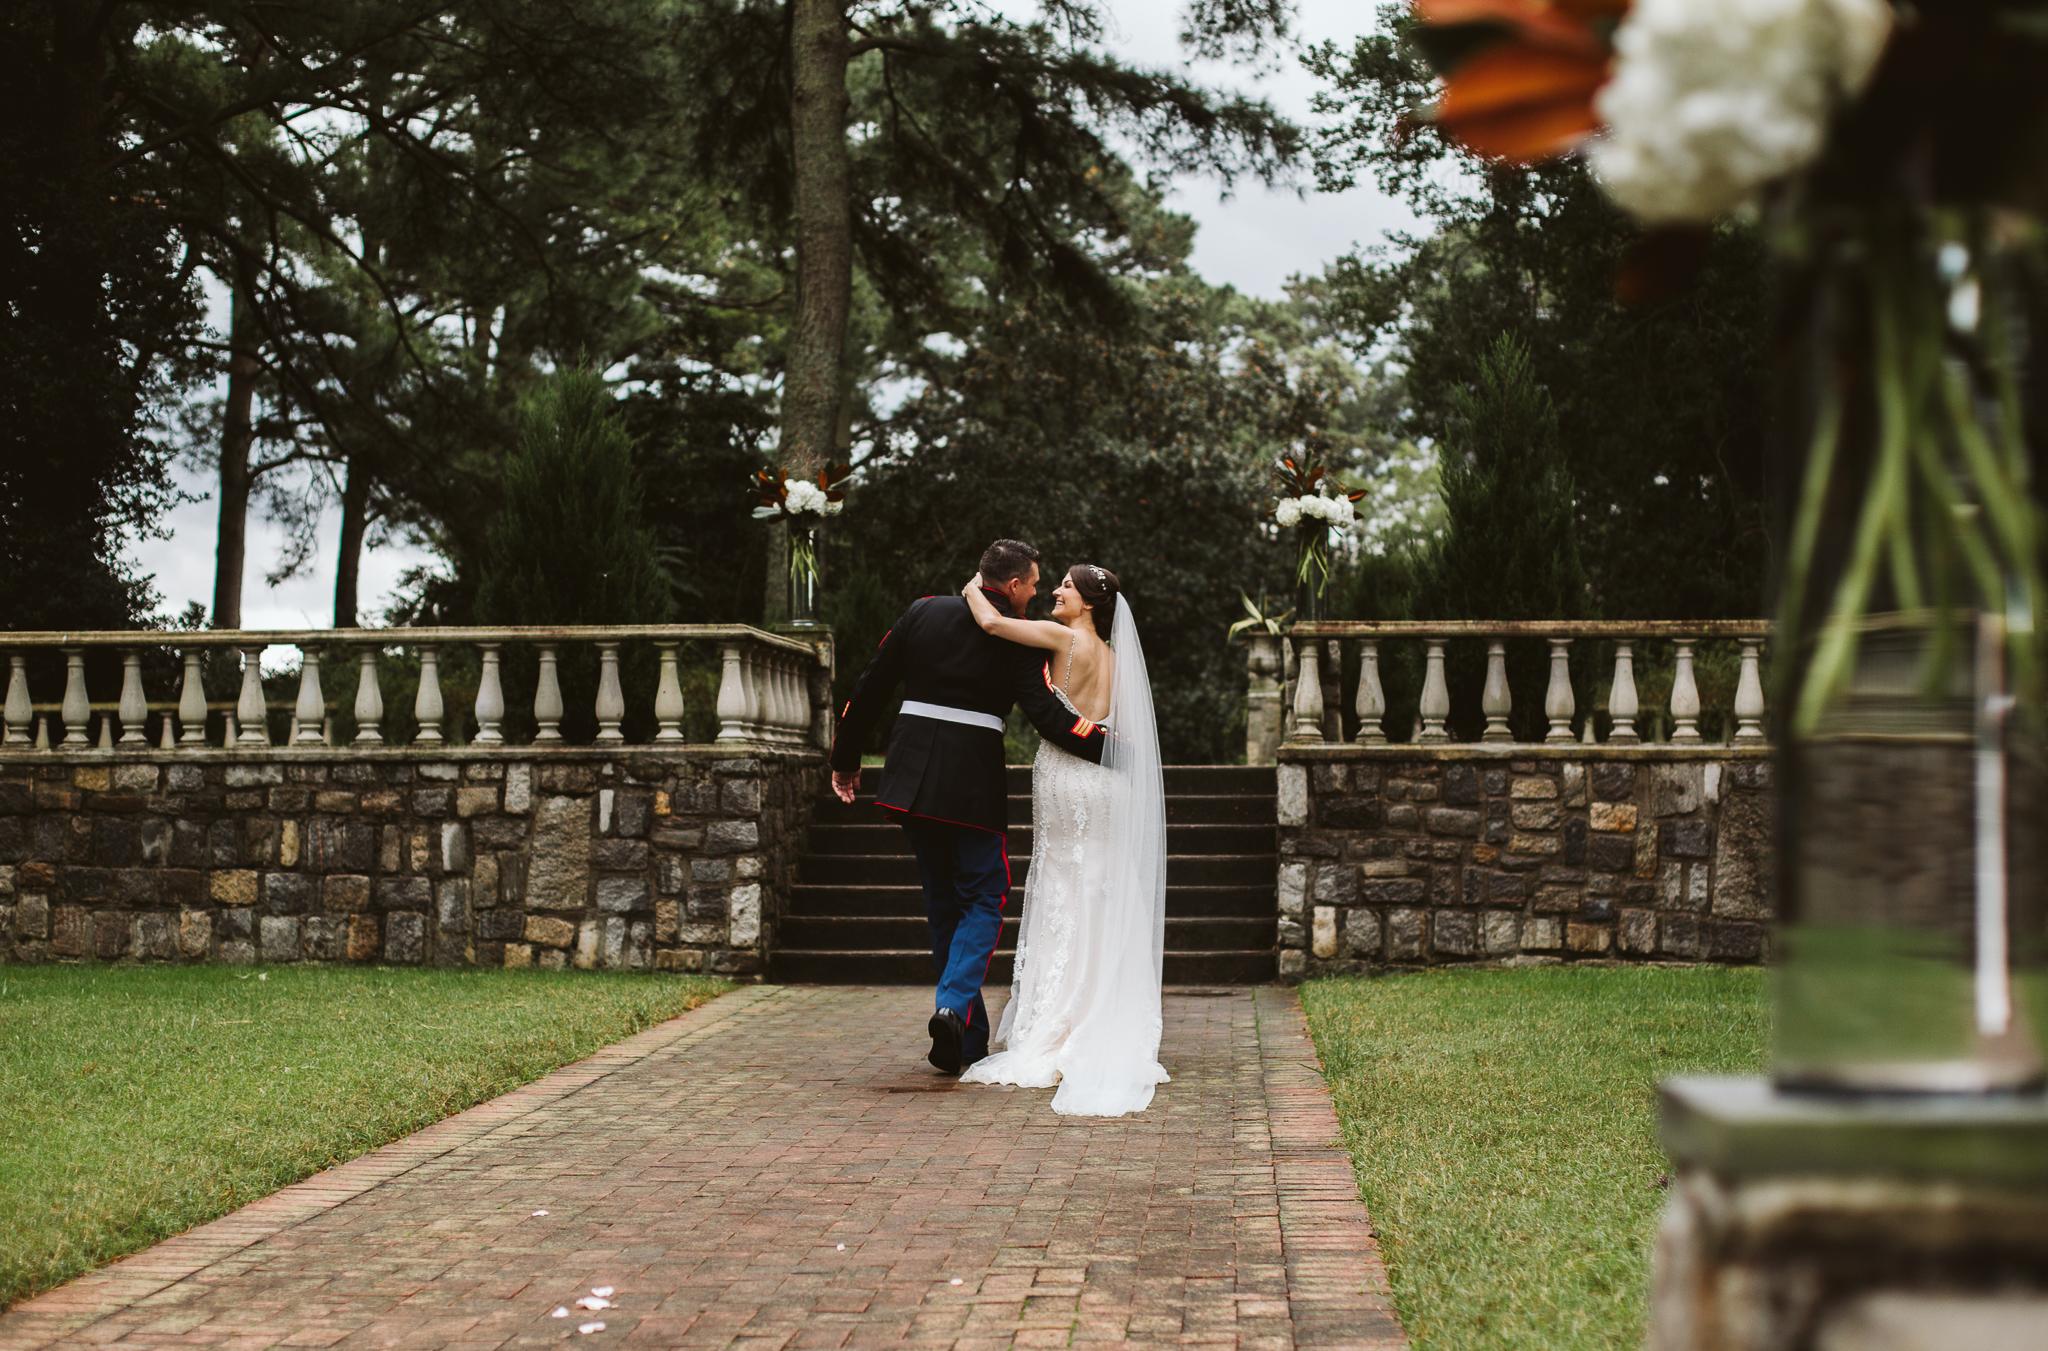 hamptonroads_wedding_norfolk_botanical_gardens-59.JPG